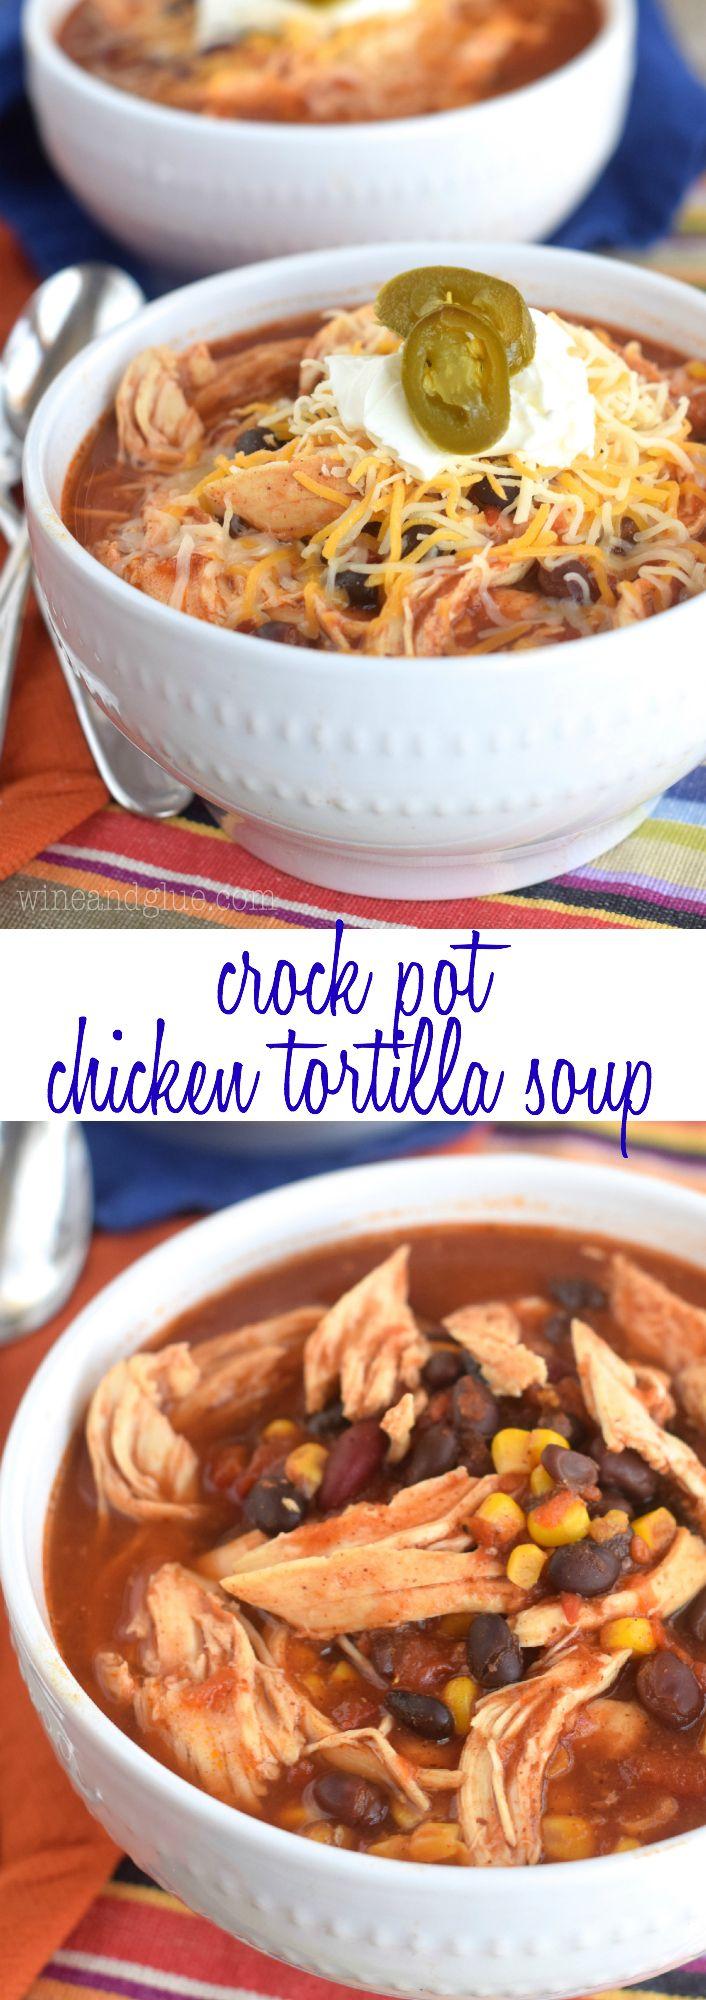 This Crock Pot Chicken Tortilla Soup   Five minutes prep and less than 300 calories a bowl!